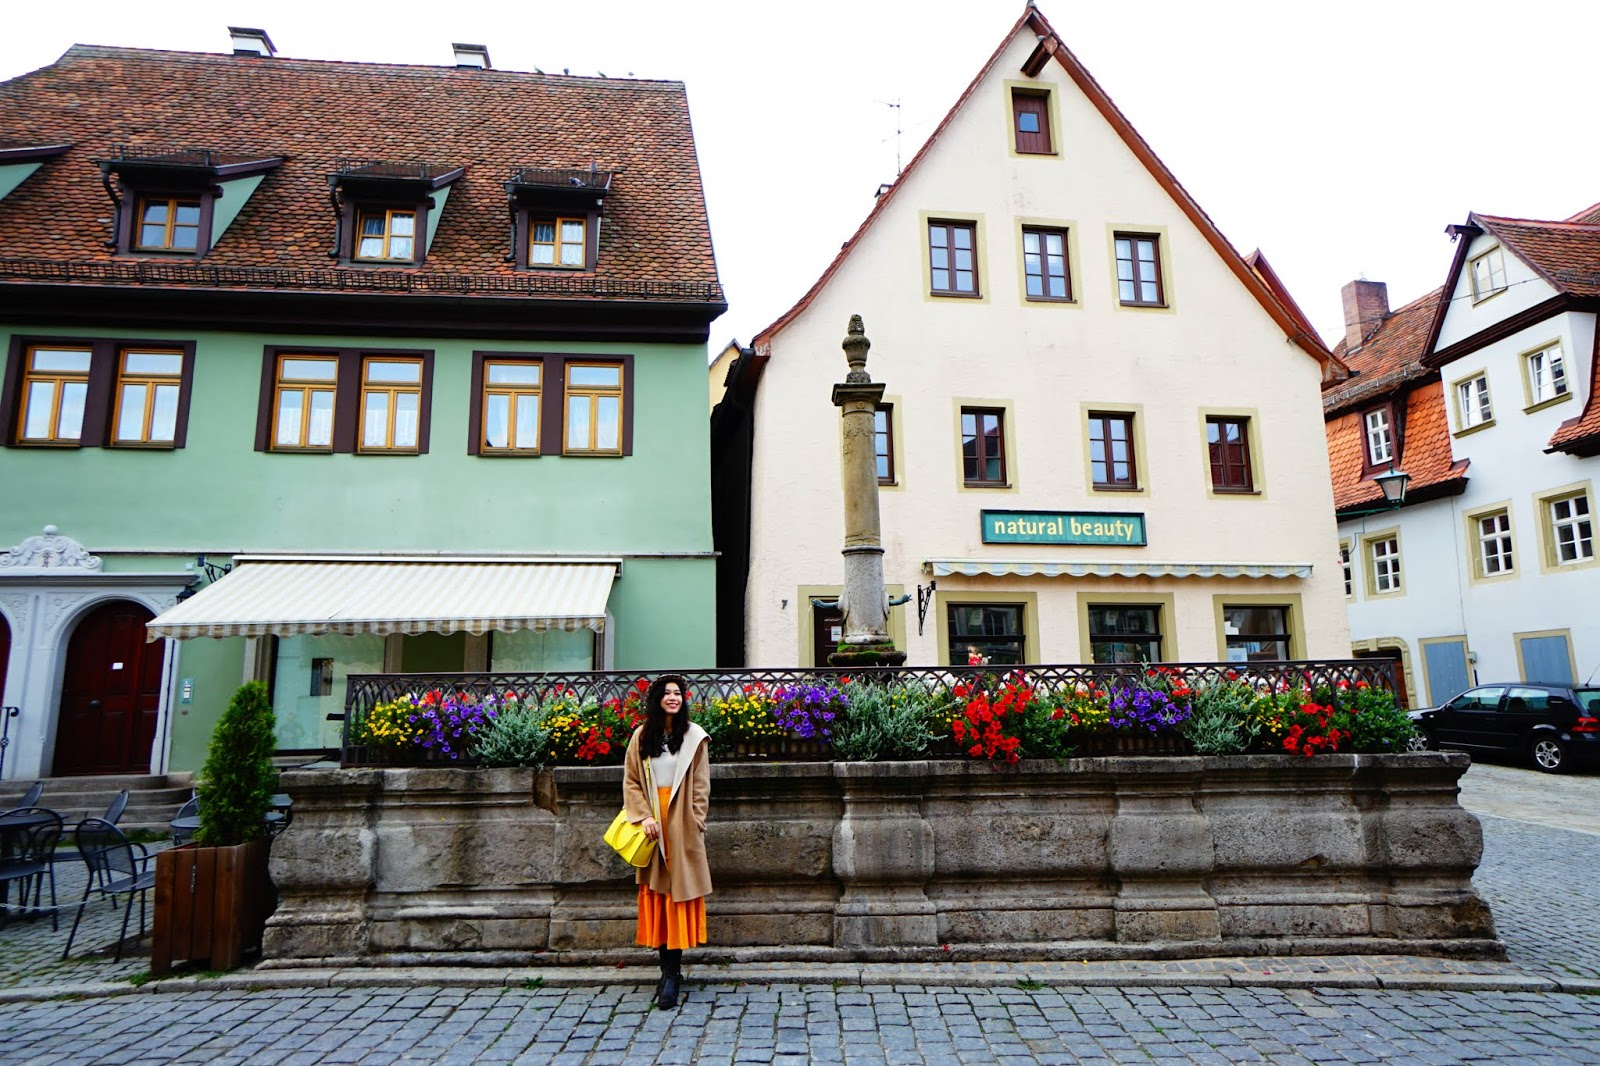 %25E5%25A9%2589%25E7%25BE%258E%25E7%2584%25A6%25E6%2585%25AE-beautyanxiety-Rothenburg%2Bob%2Bder%2BTauber-DSC04111.jpg